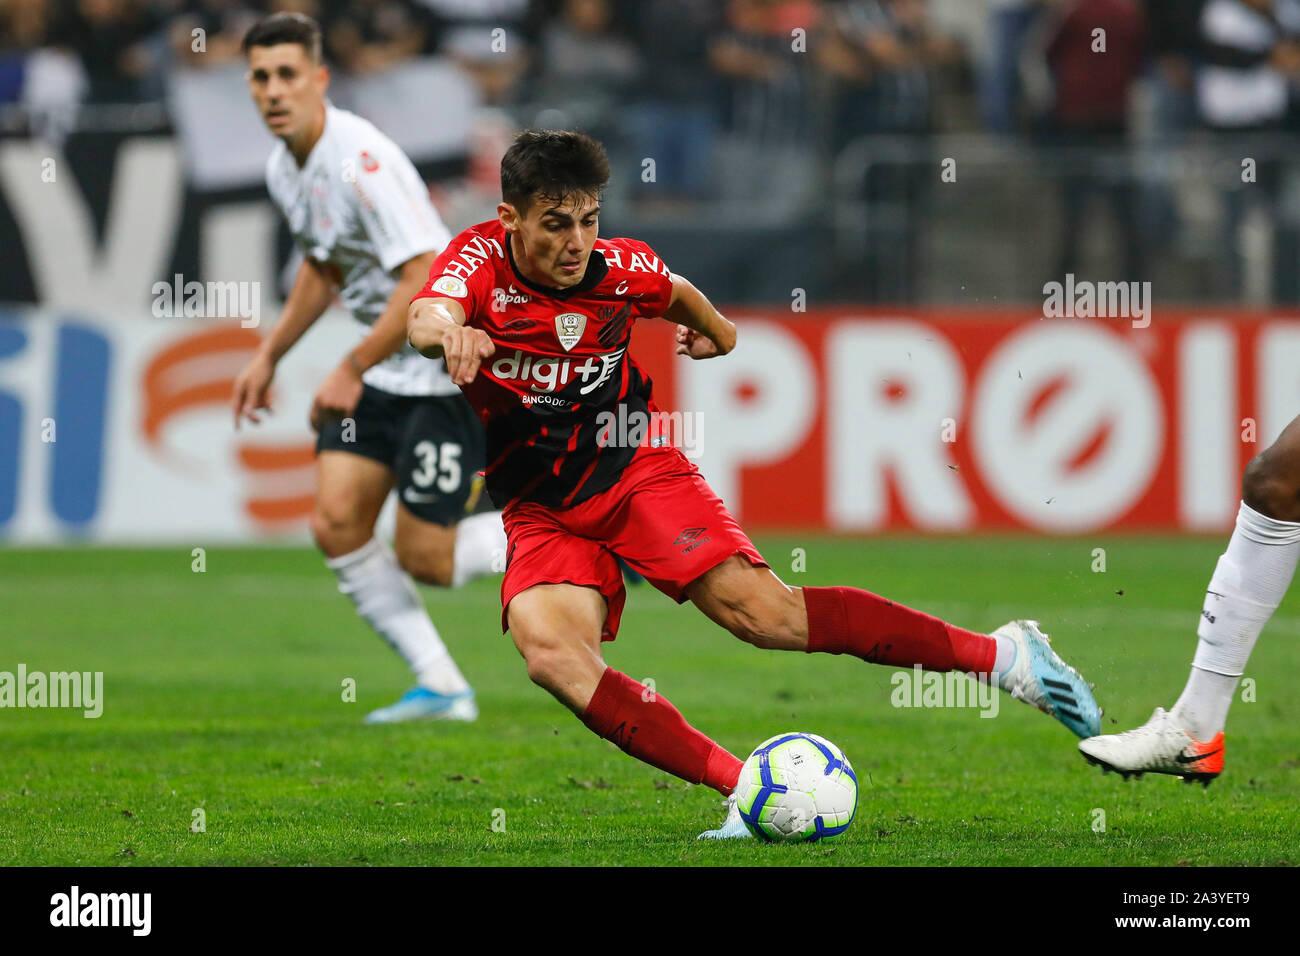 Sao Paulo Sp 10 10 2019 Corinthians X Athletico Paranaense Athletico Pr S Leo Cittadini Kicks To Score